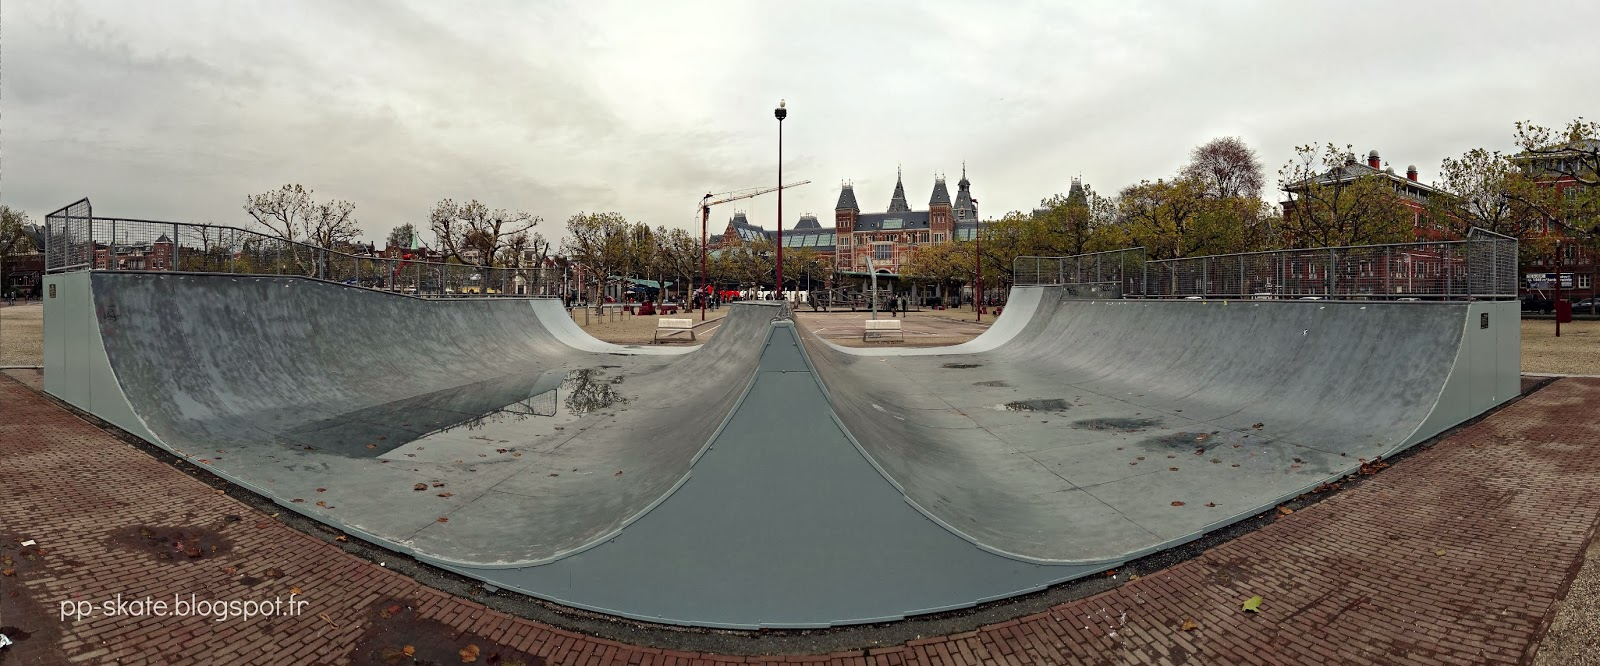 Skate park Amsterdam